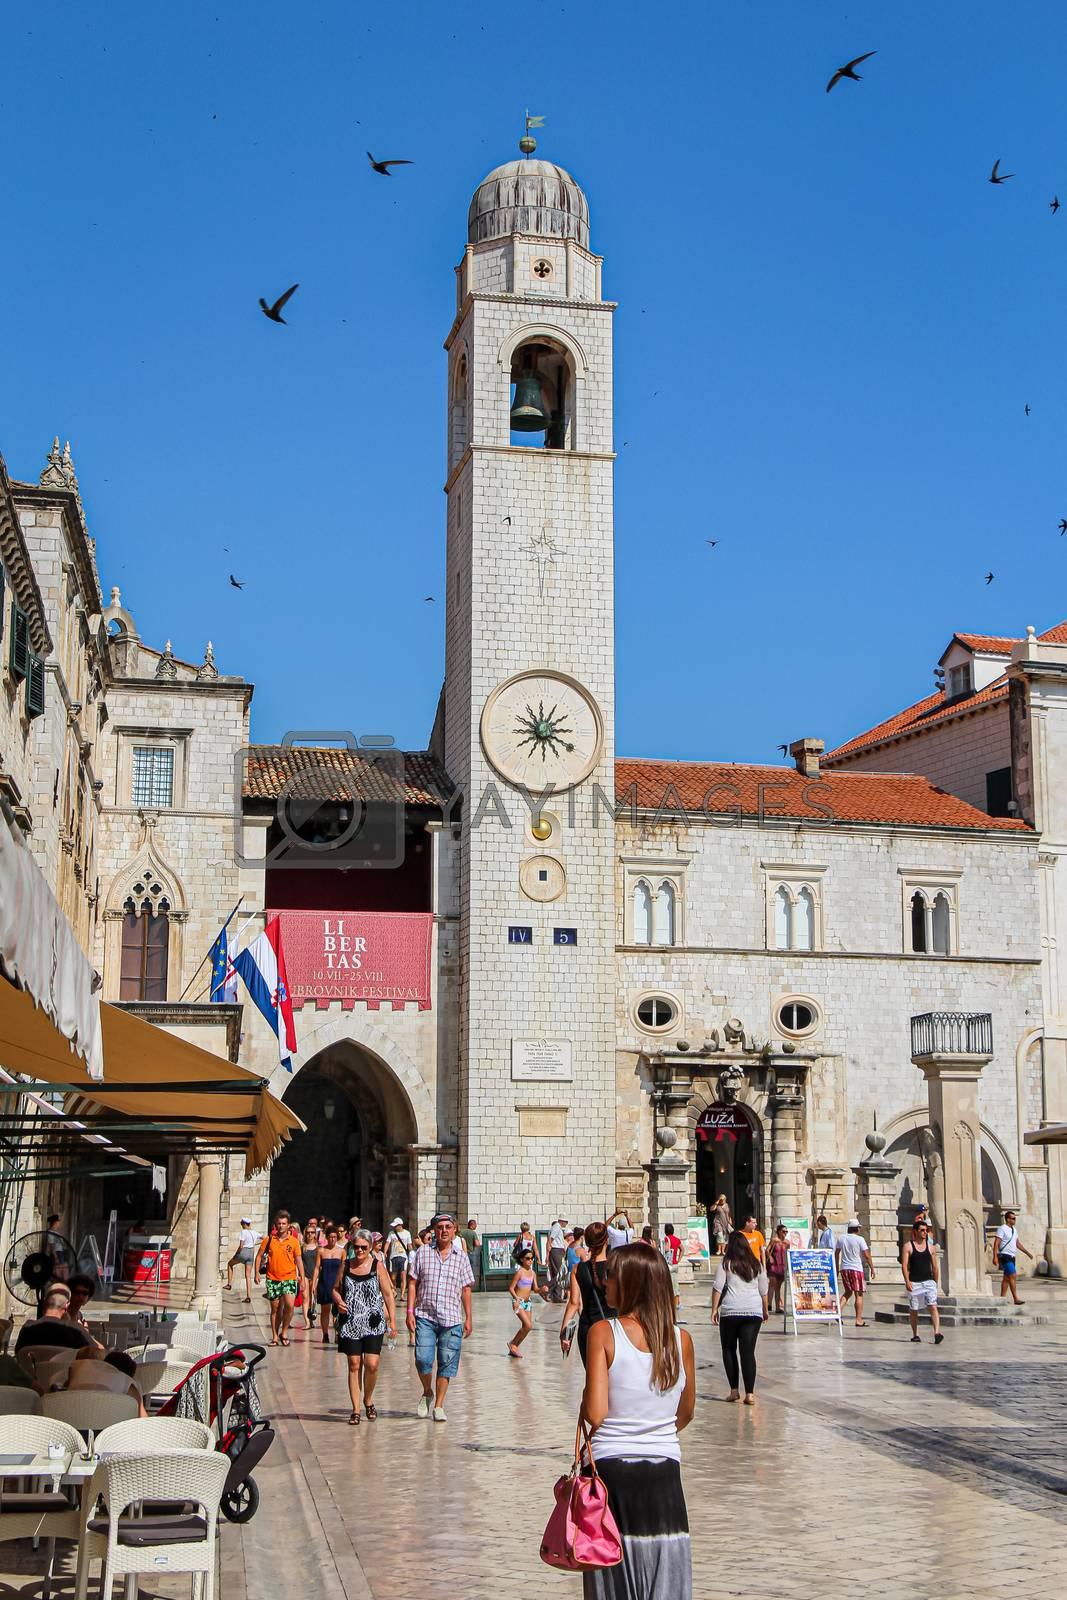 Dubrovnik, Croatia - July 15th 2018: The Zvonik Clock tower at Orlando's Column and the Church of Saint Blaise, Dubrovnik, Croatia